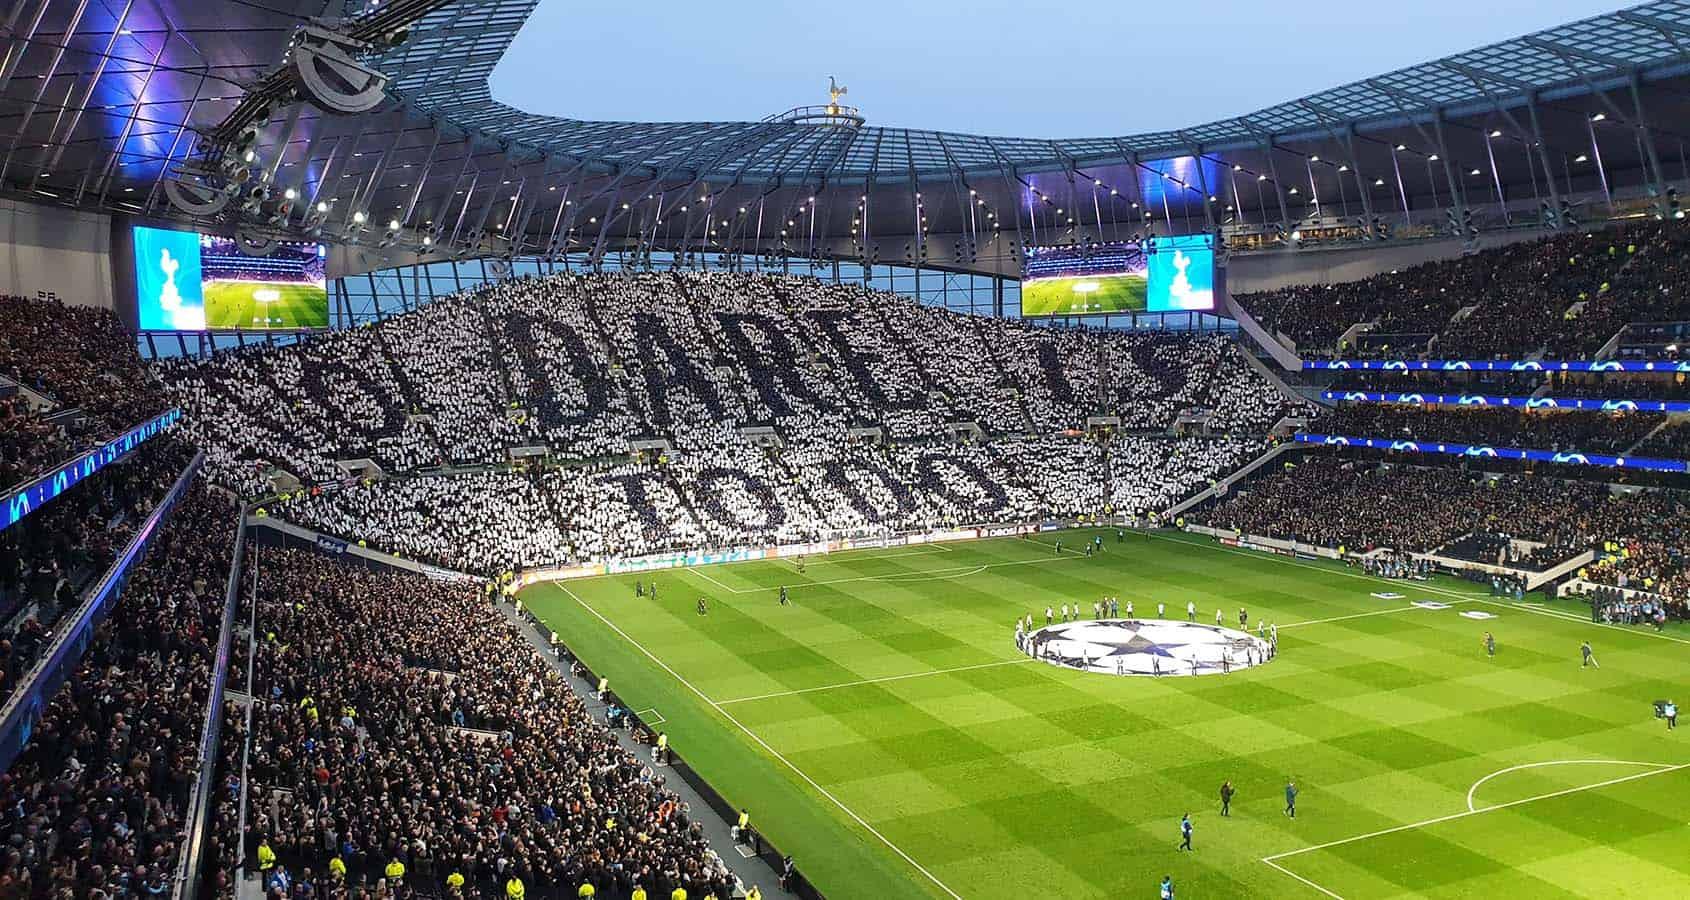 Fotbollsresor, Tottenham Hotspur Stadium, Biljetter, England, London, Premier League